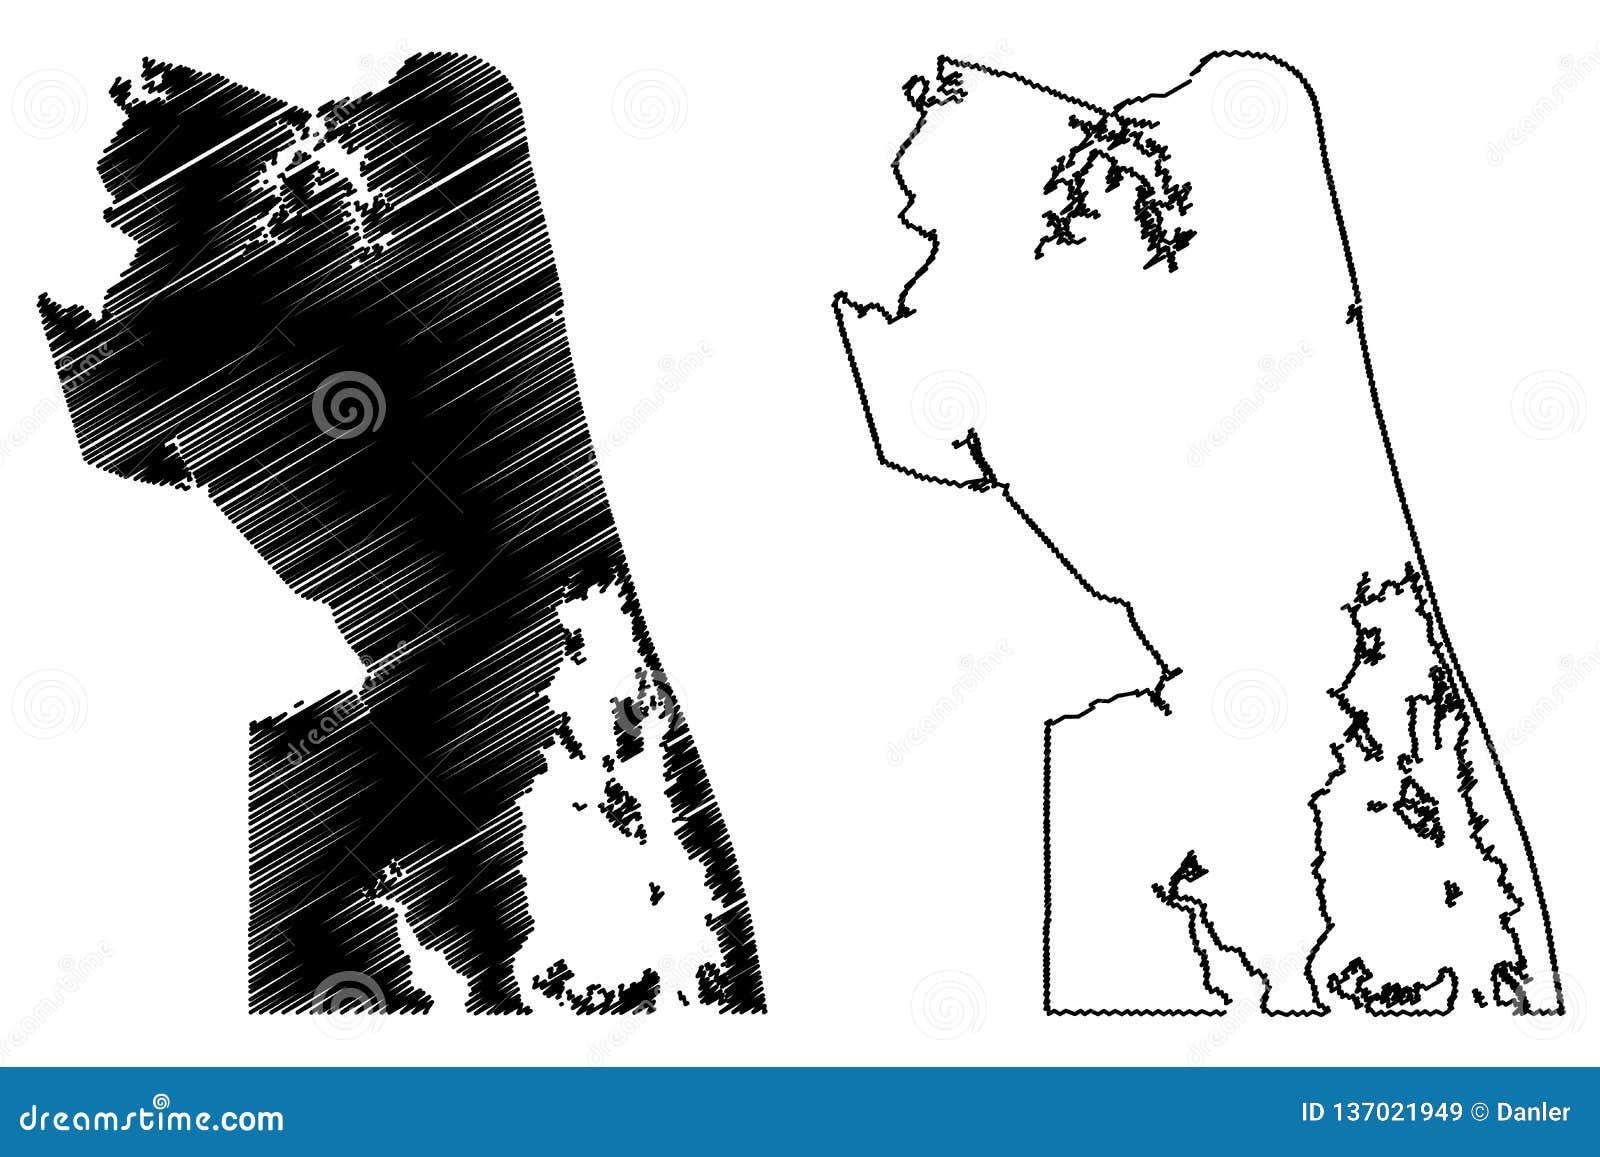 Virginia Beach City Map Vector Stock Vector - Illustration ...